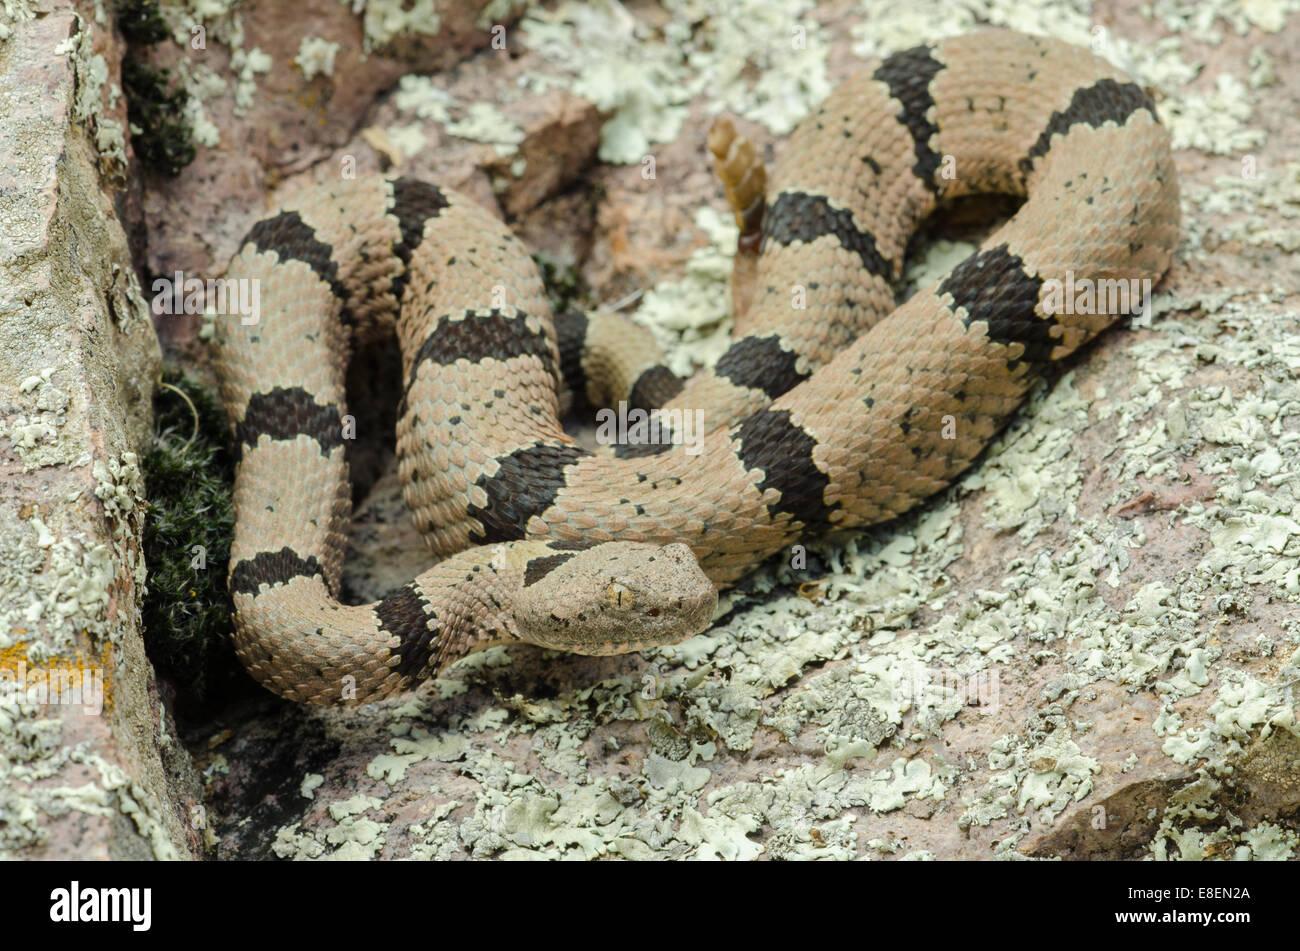 New mexico socorro county magdalena - Male Banded Rock Rattlesnake Crotalus Lepidus Klauberi Magdalena Mountains Socorro Co New Mexico Usa